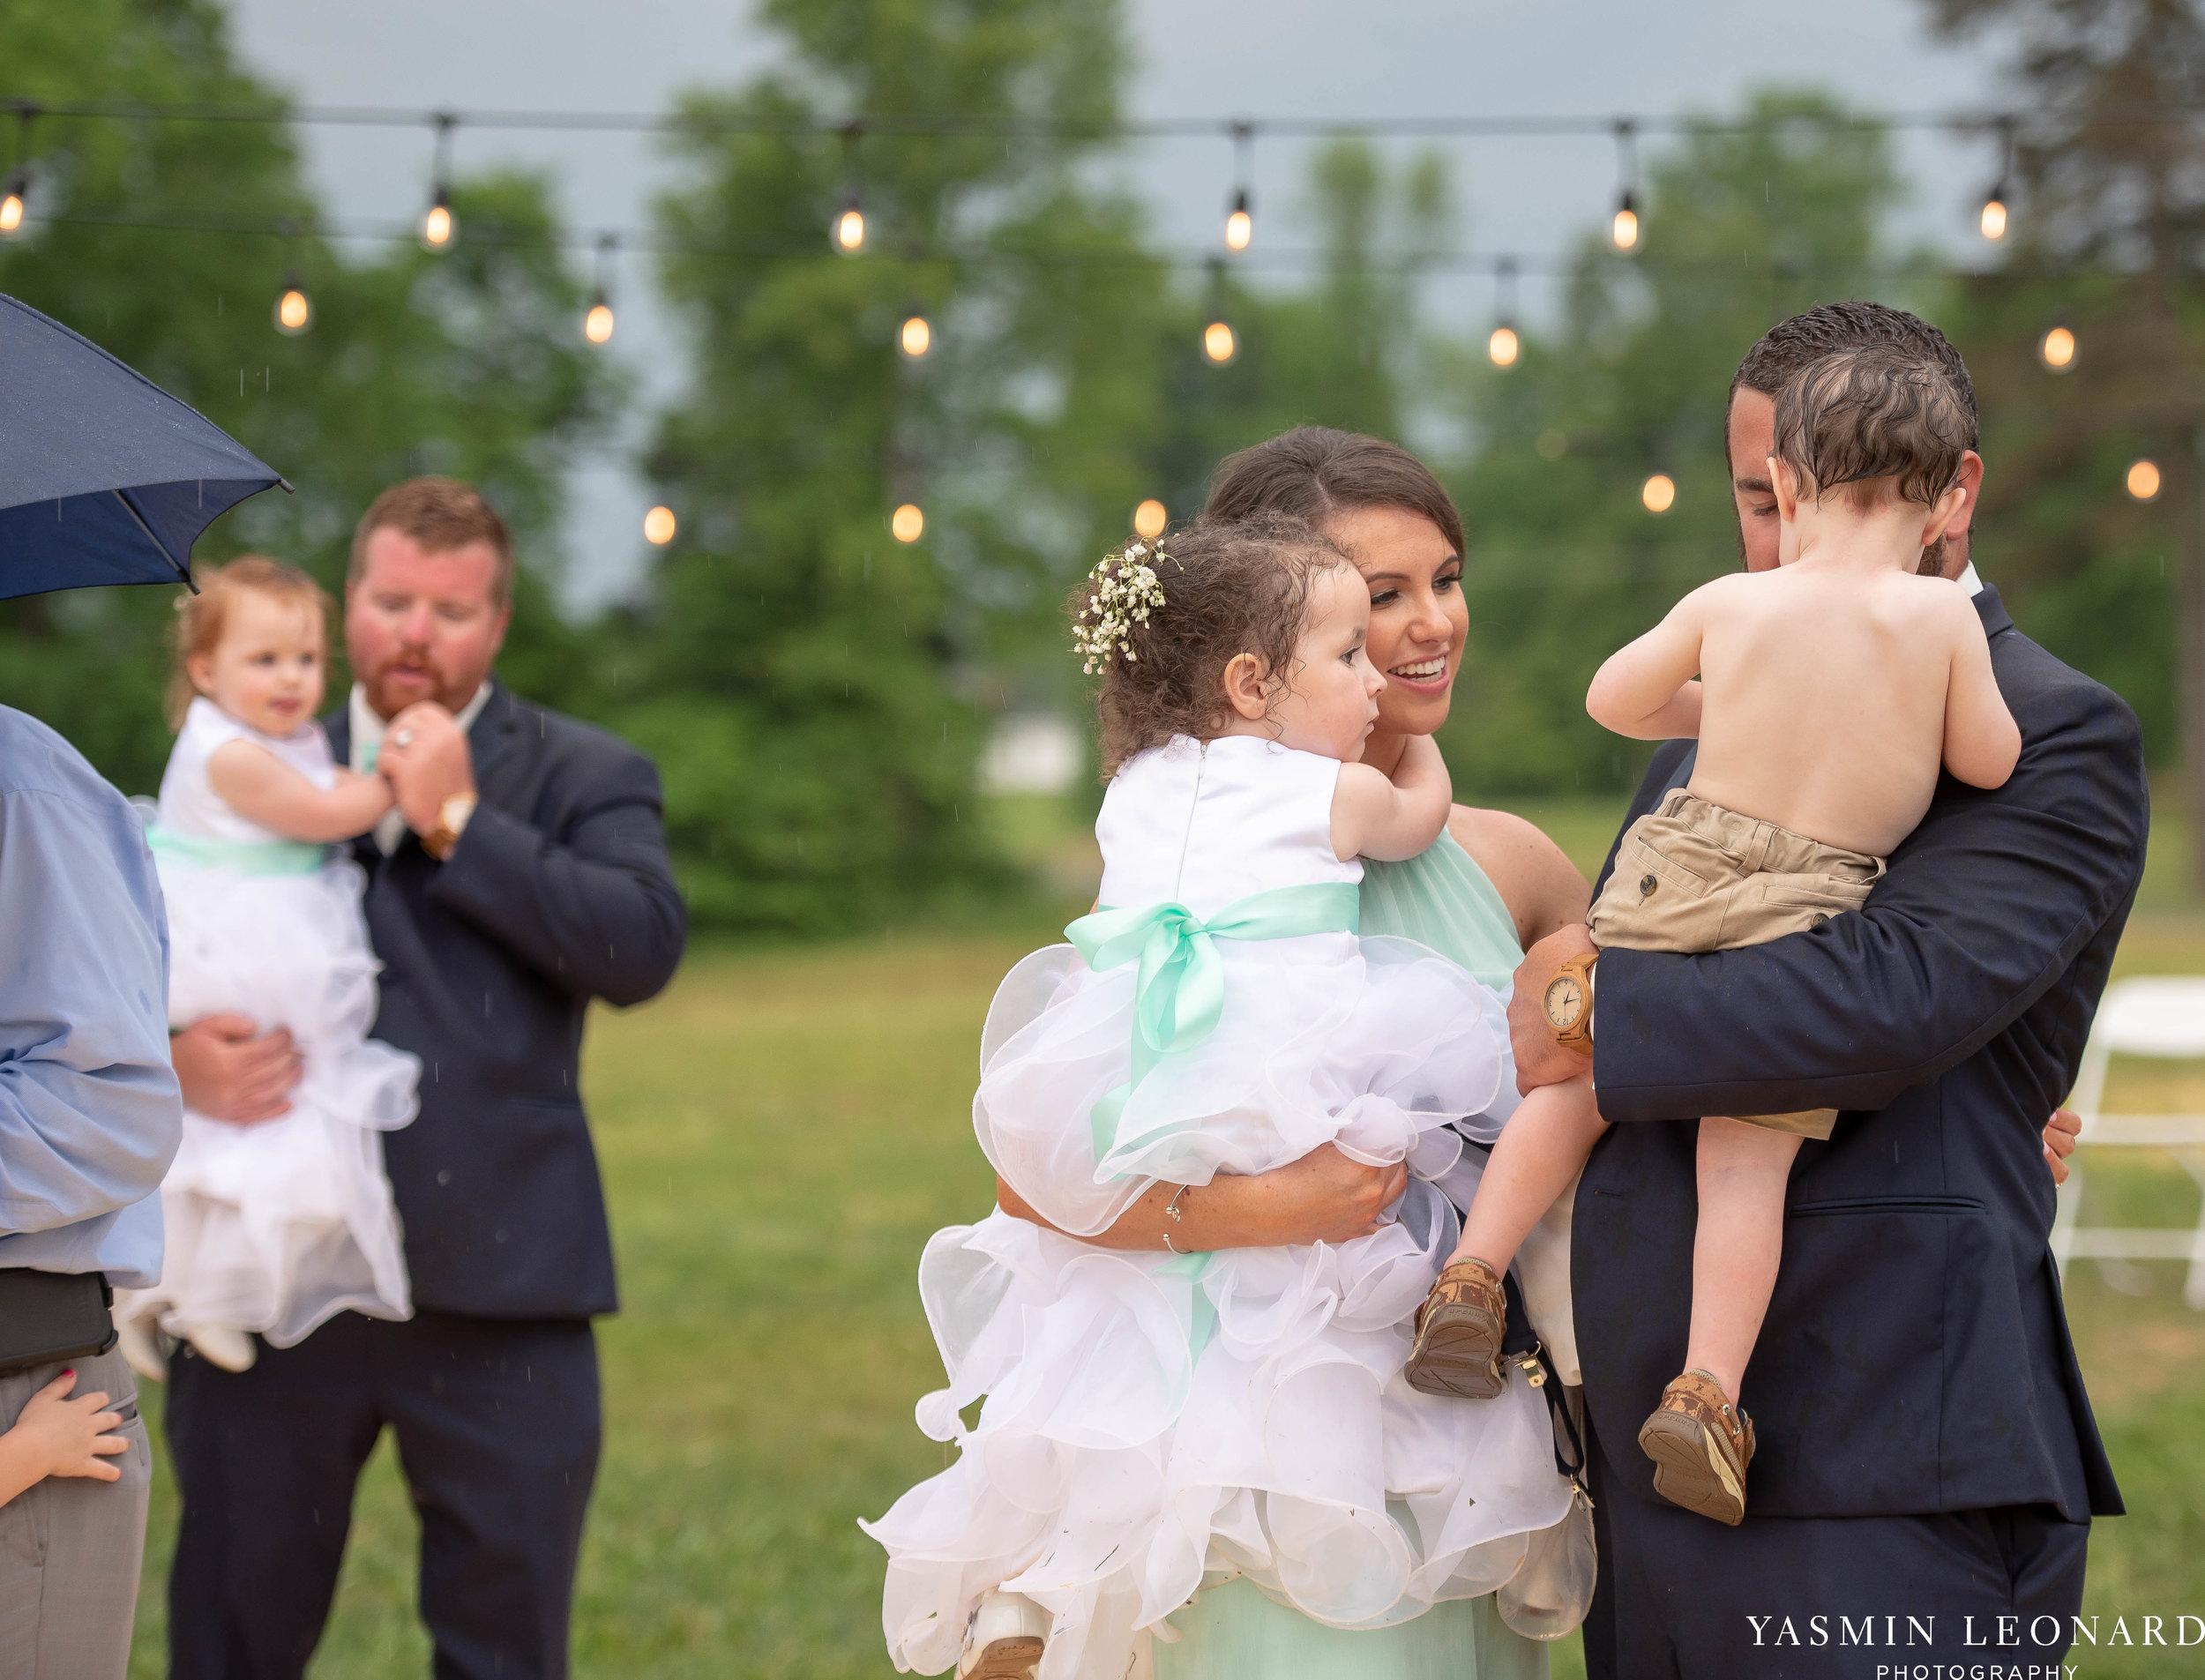 Rain on your wedding day - Rainy Wedding - Plan B for Rain - What to do if it rains on your wedding day - Wedding Inspiration - Outdoor wedding ideas - Rainy Wedding Pictures - Yasmin Leonard Photography-64.jpg